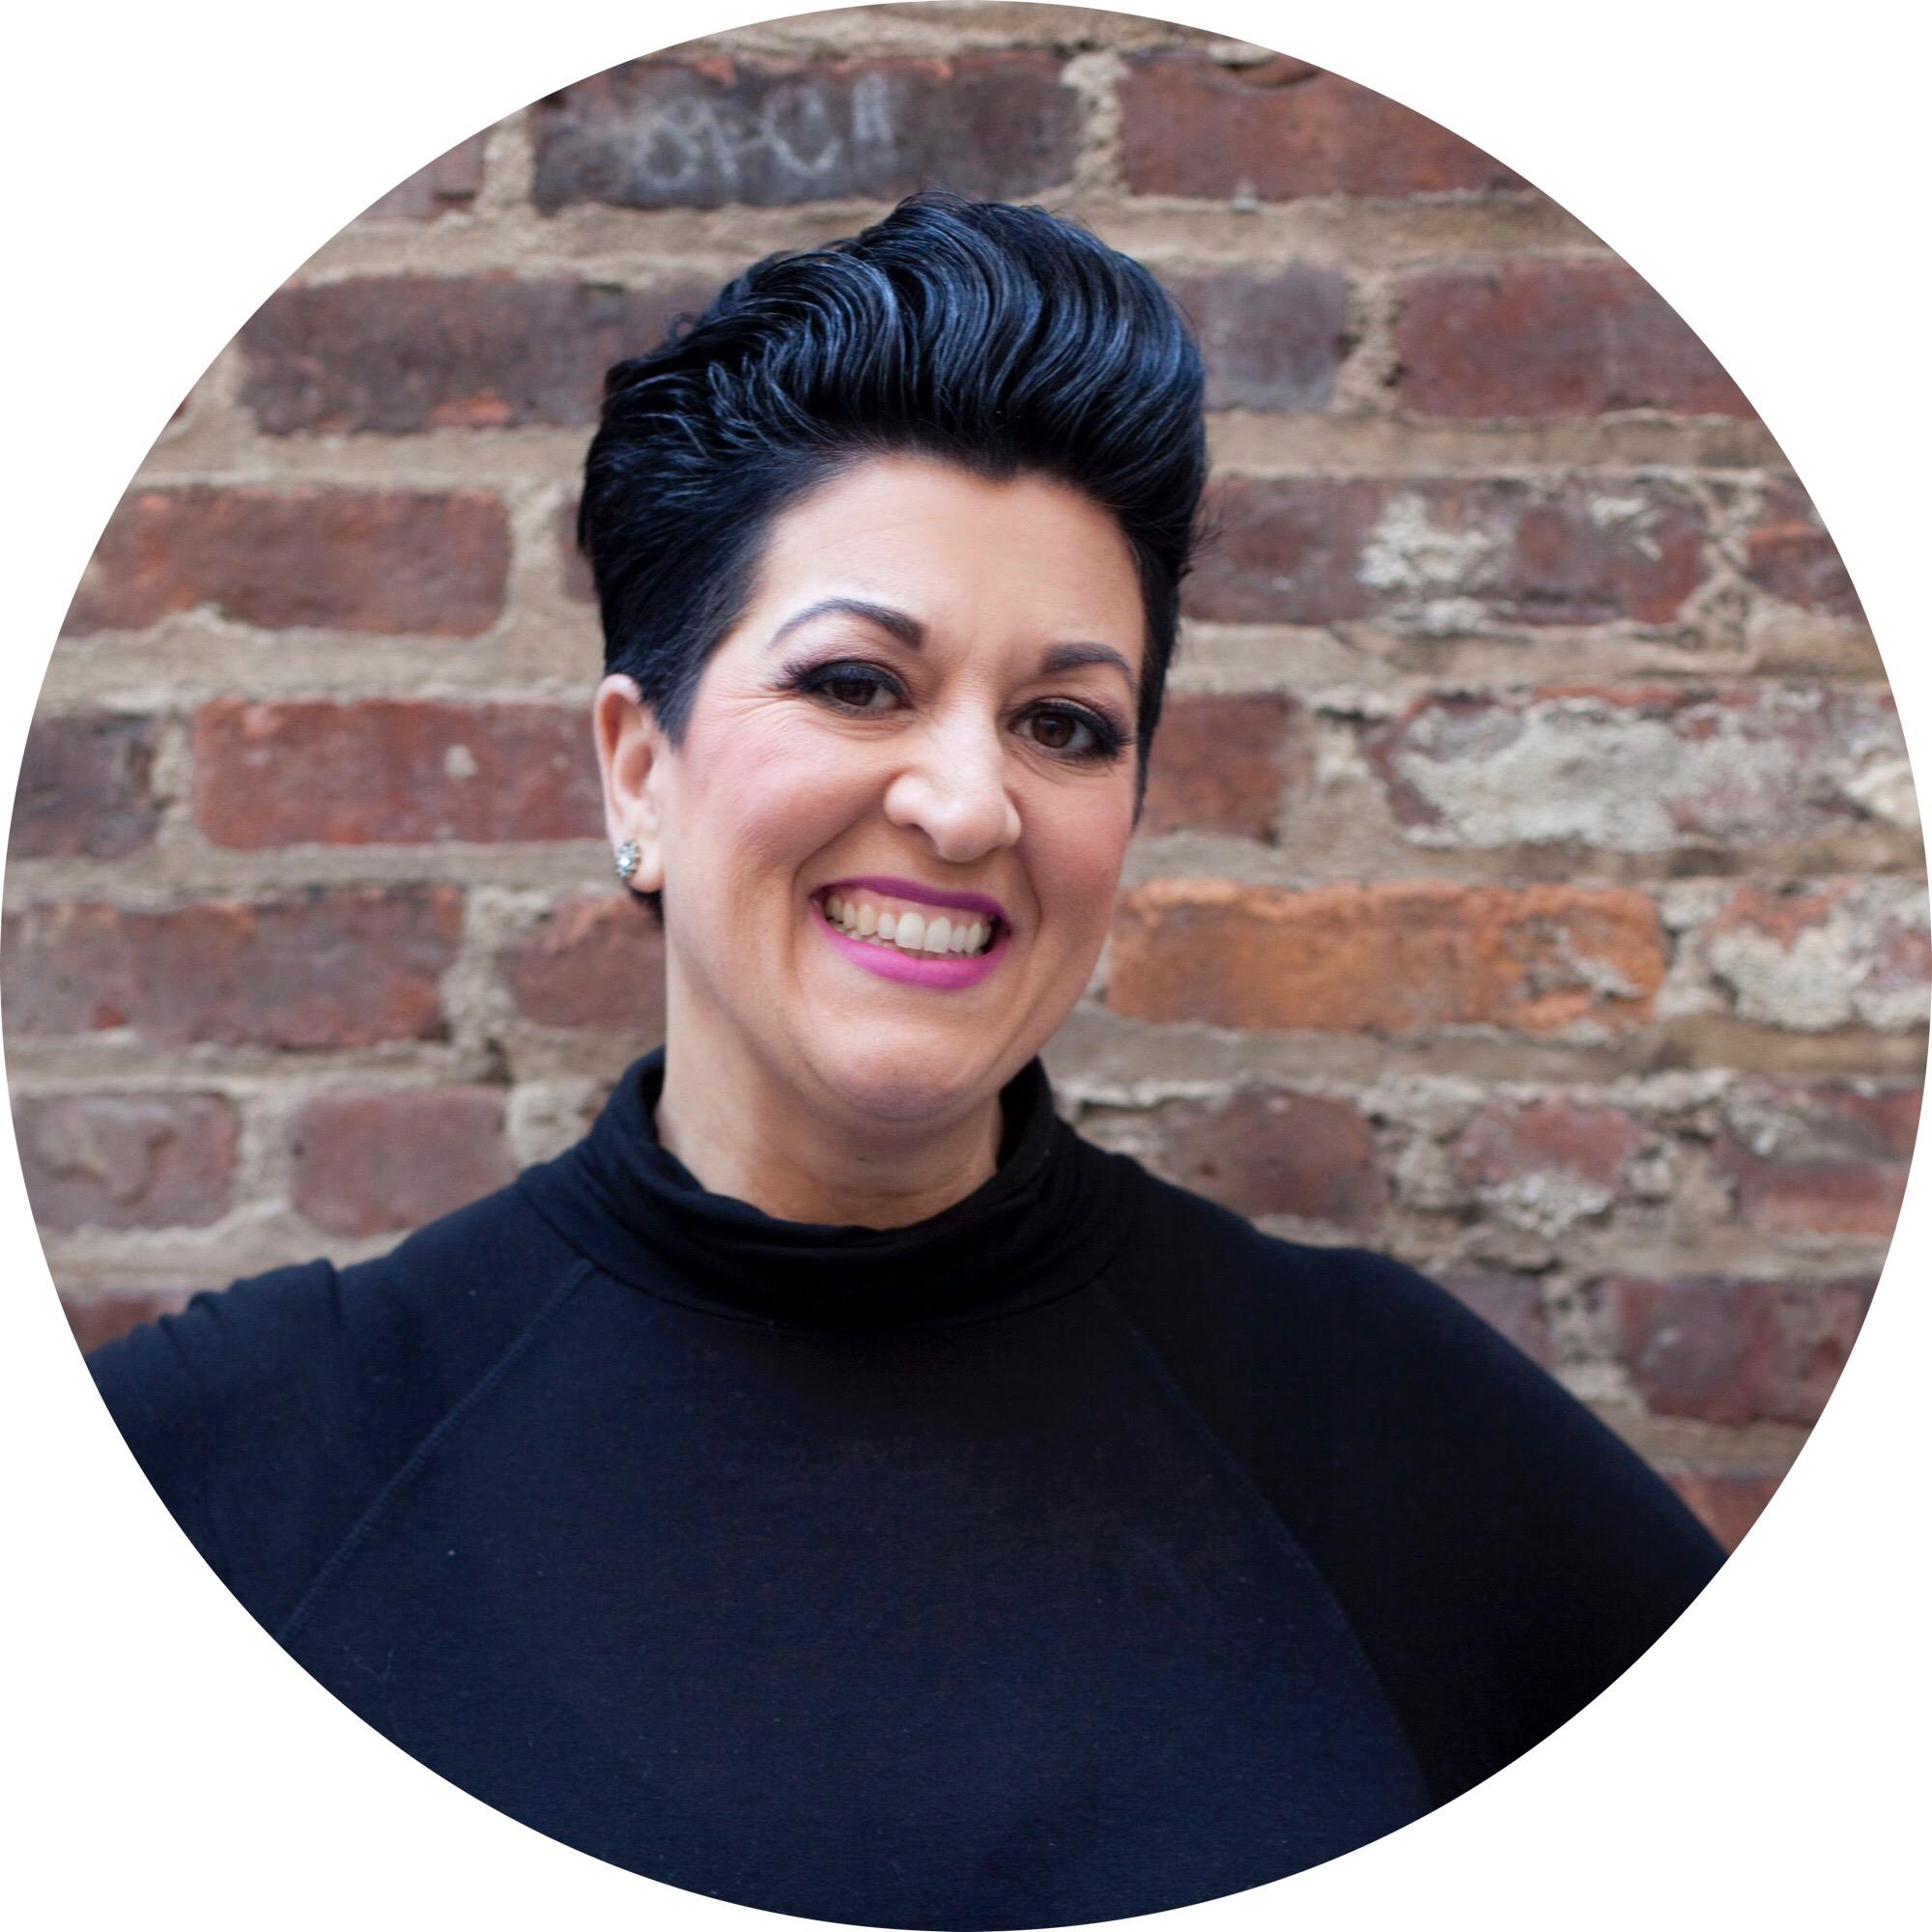 OPC Co-owner and lead stylist, Jane Ziemer-Hernadez